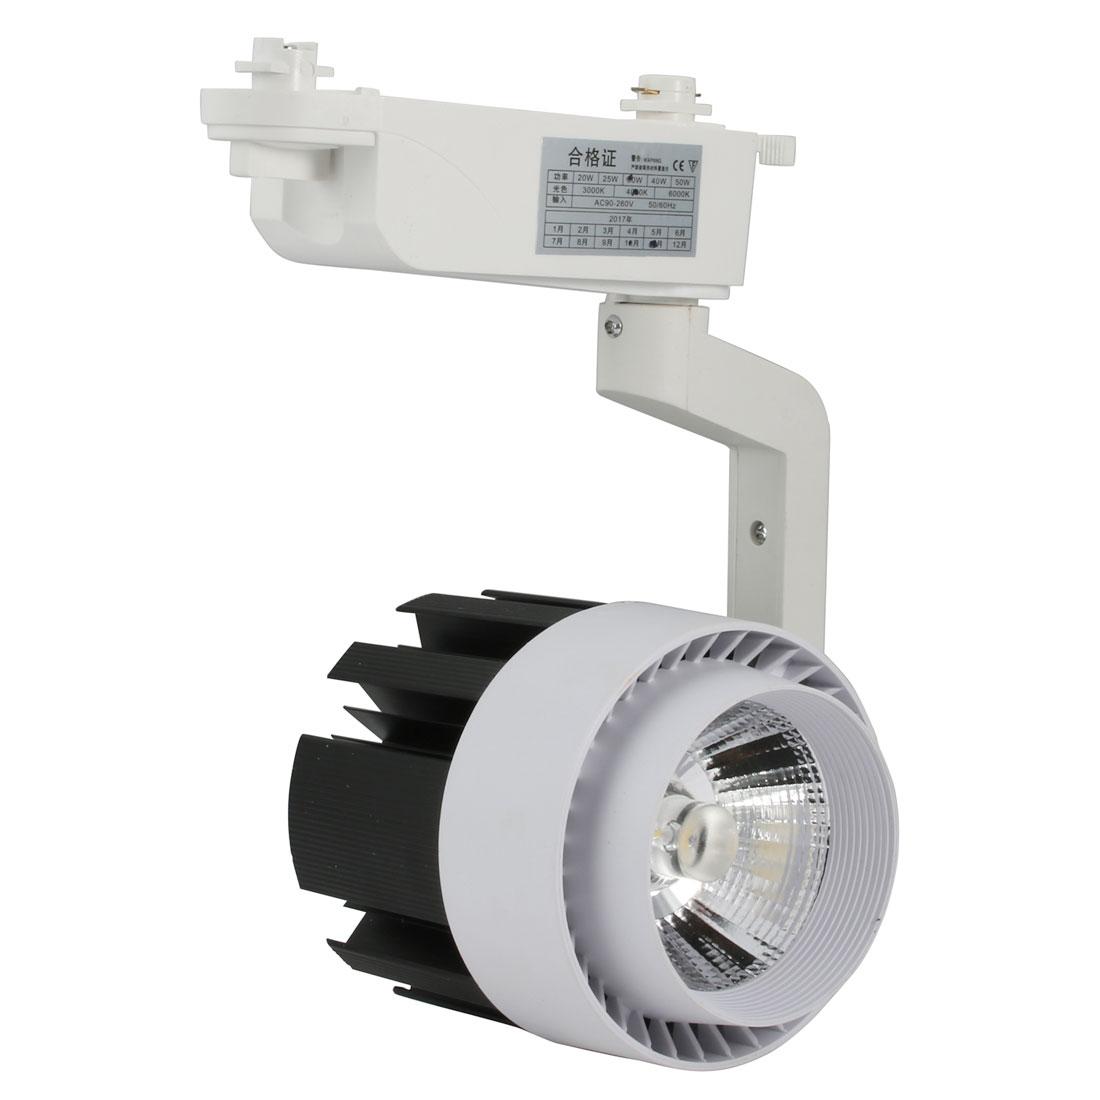 AC165-230V 24W COB Chip LED Ceiling Track Rail Light Spotlight Neutral Light